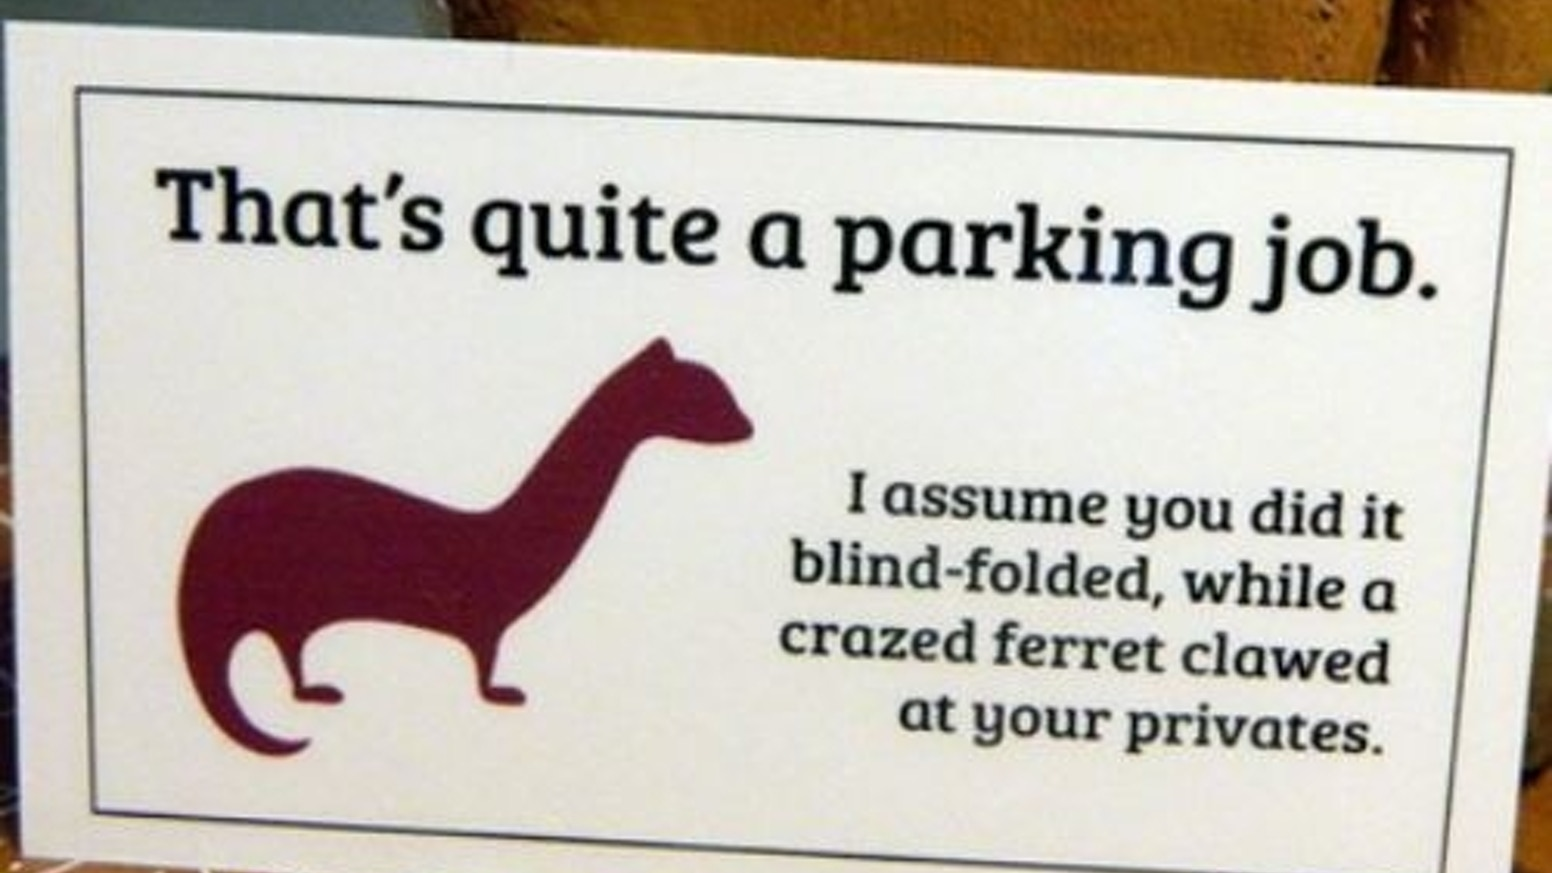 Nice parking job business cards by john pozadzides kickstarter nice parking job business cards colourmoves